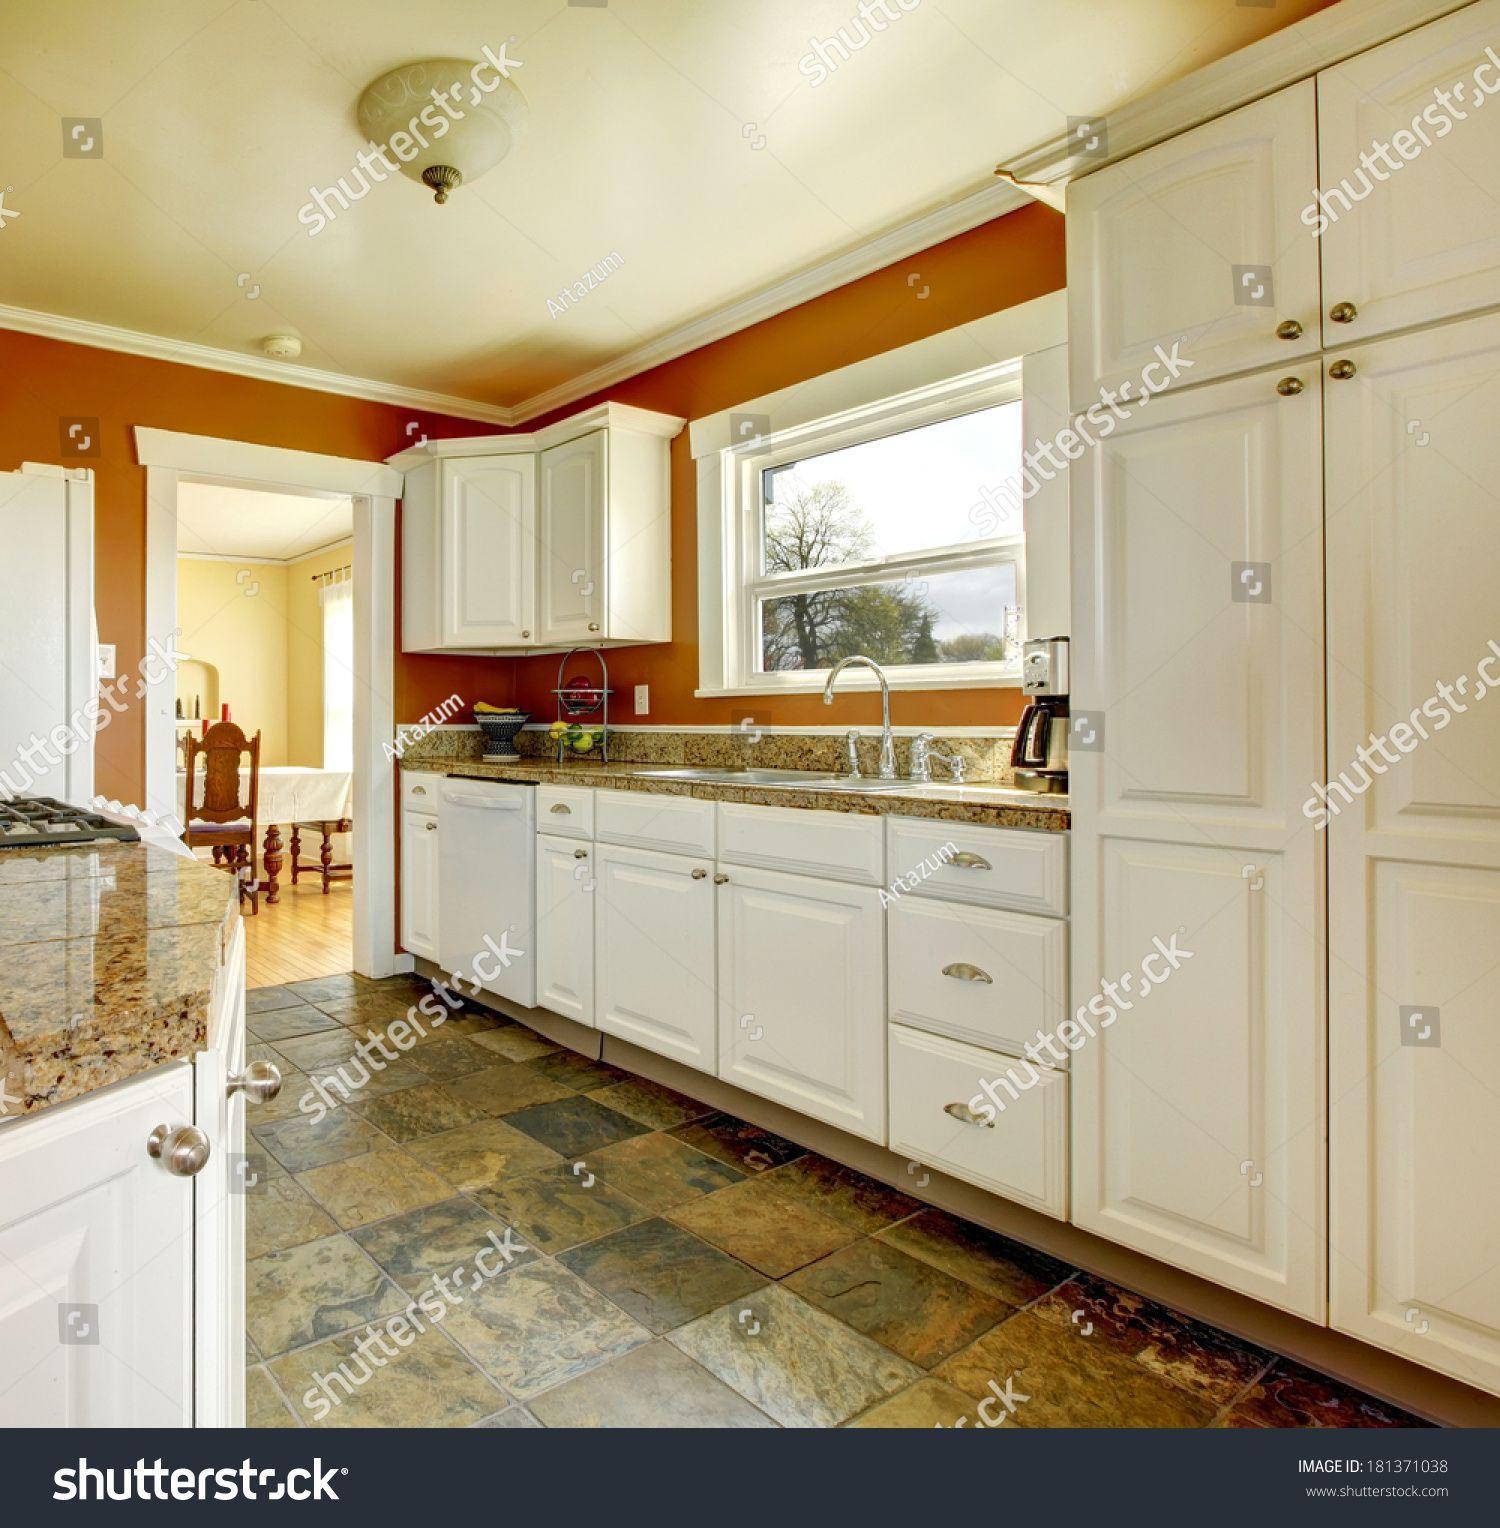 Kitchen Room With Concrete Floor Orange Walls And White Storage Combination Ad Affiliate In 2020 Kitchen Cabinets Kitchen Cabinet Design Kitchen Cabinets Orange